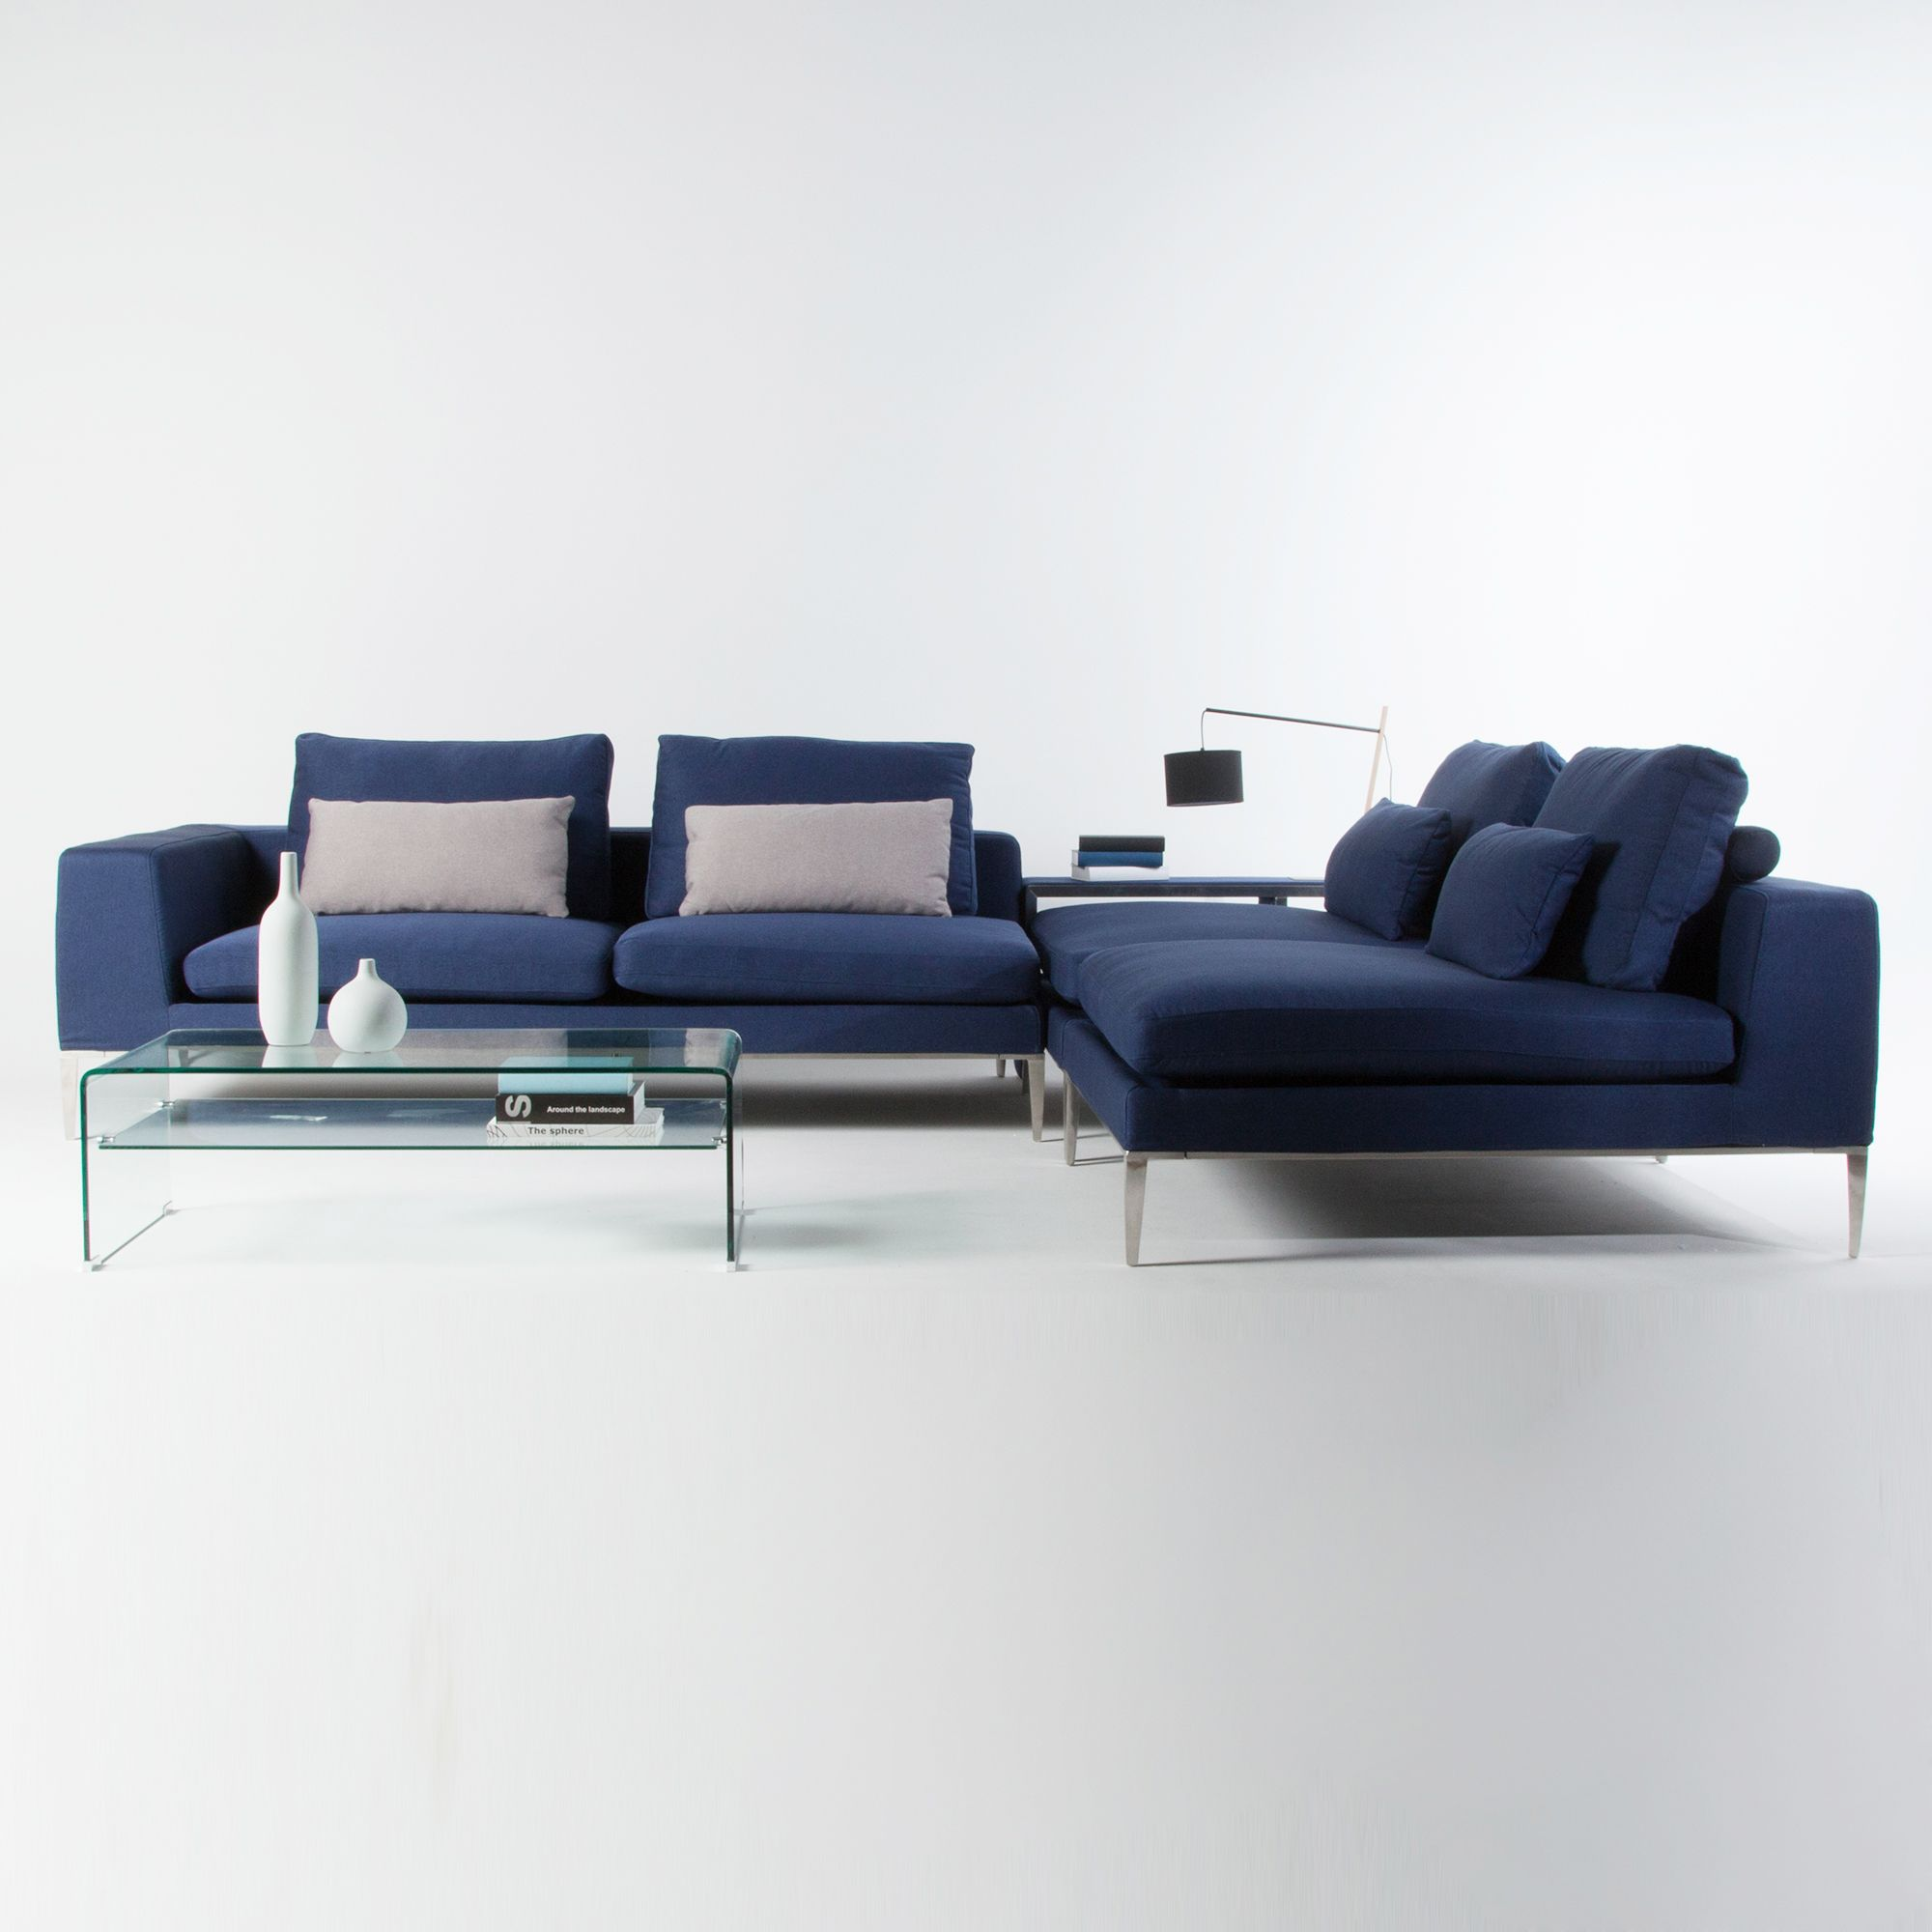 Canapé Dangle Modulable Tissu Bleu Places Avec Pieds Métal - Canape angle modulable tissu